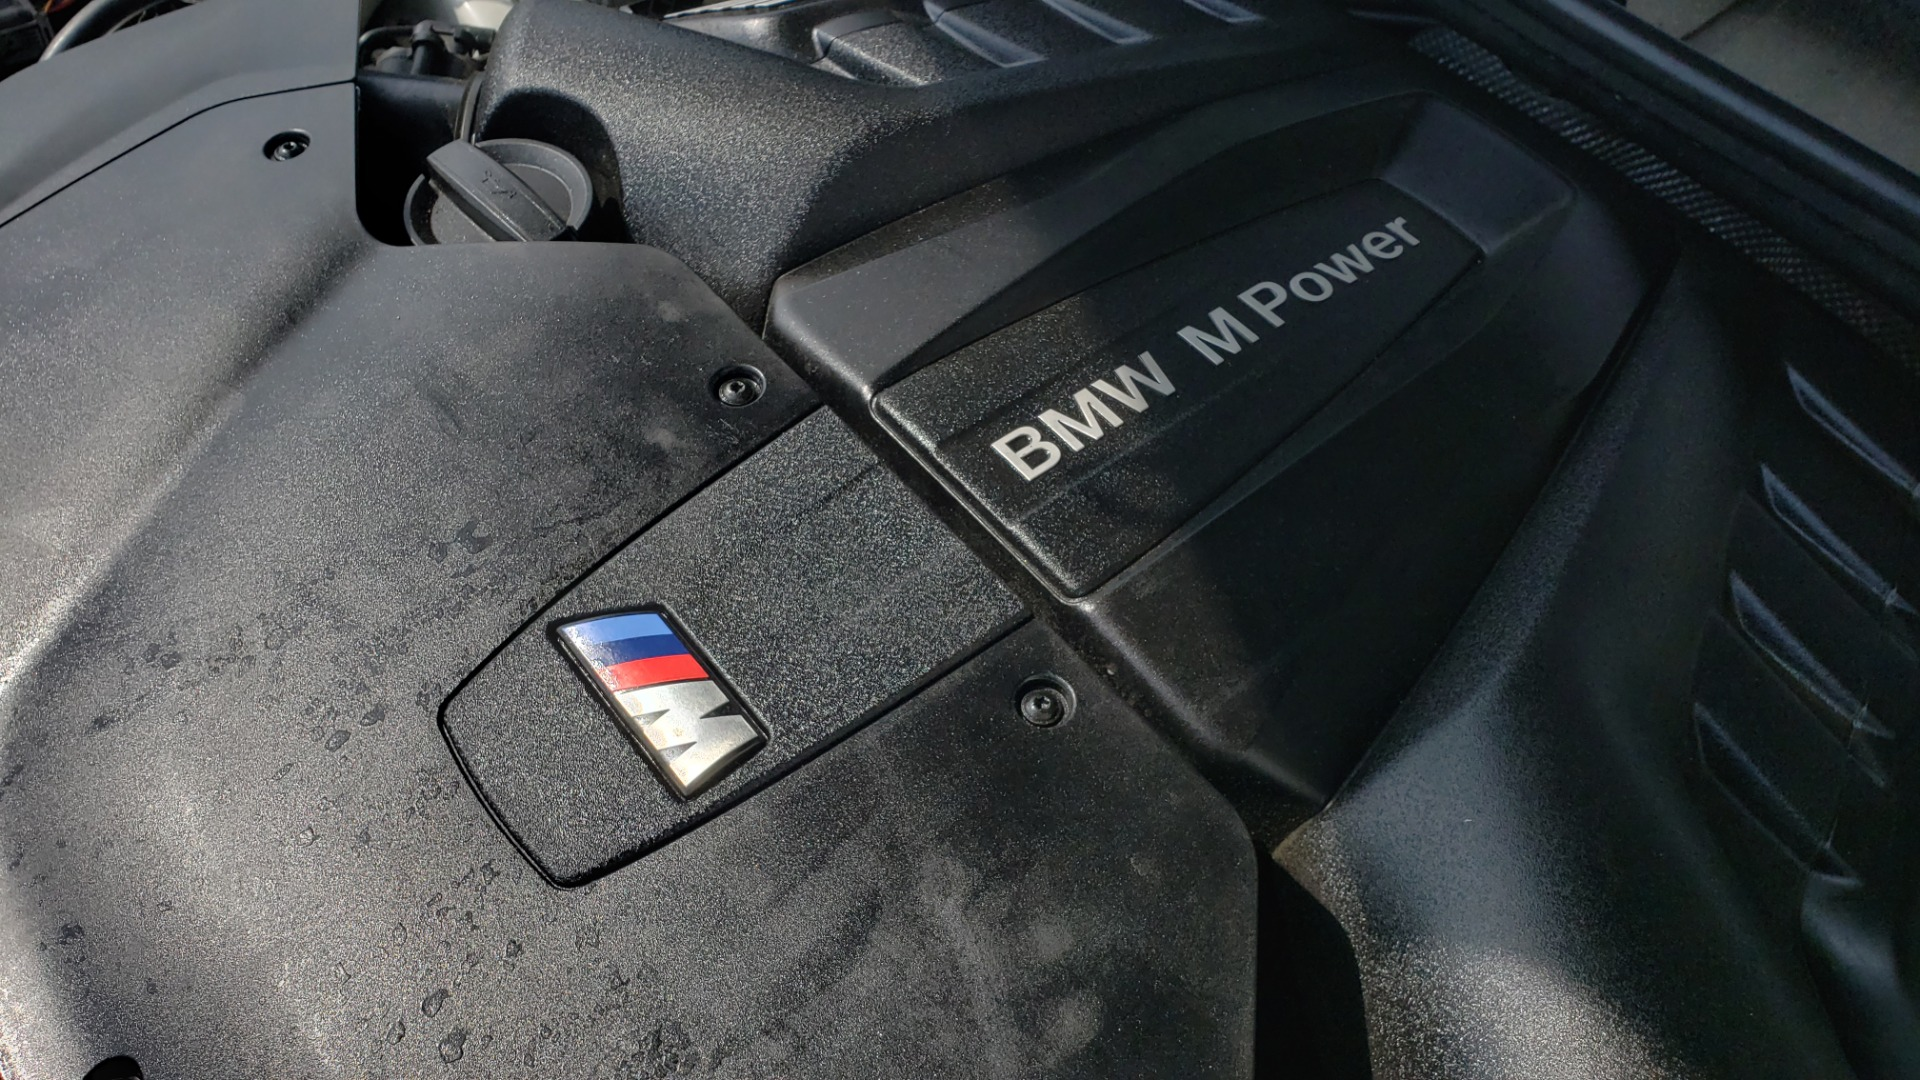 Used 2017 BMW X5 M EXECUTIVE PKG / NAV / DRVR ASST / BSM / HUD / HTD STS / WIFI for sale Sold at Formula Imports in Charlotte NC 28227 15